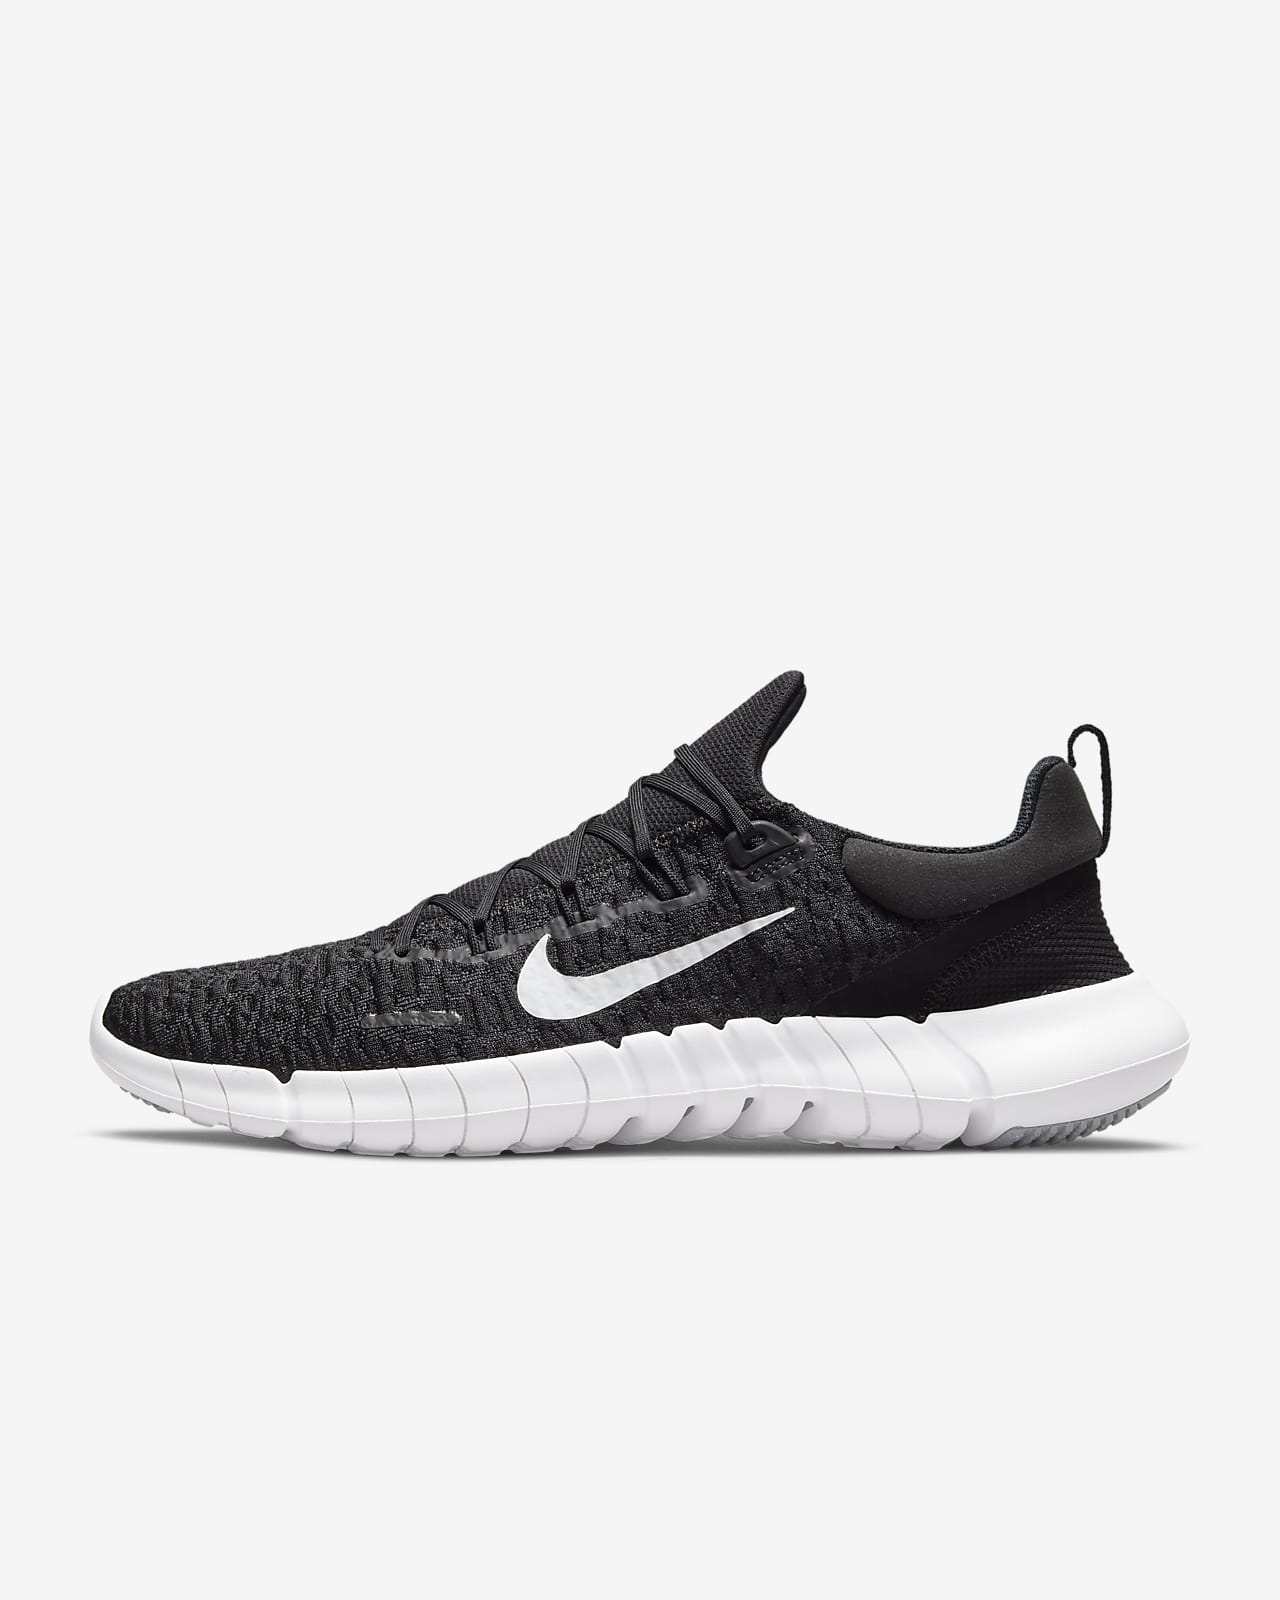 Chaussure de running sur route Nike Free Run5.0 pour Homme